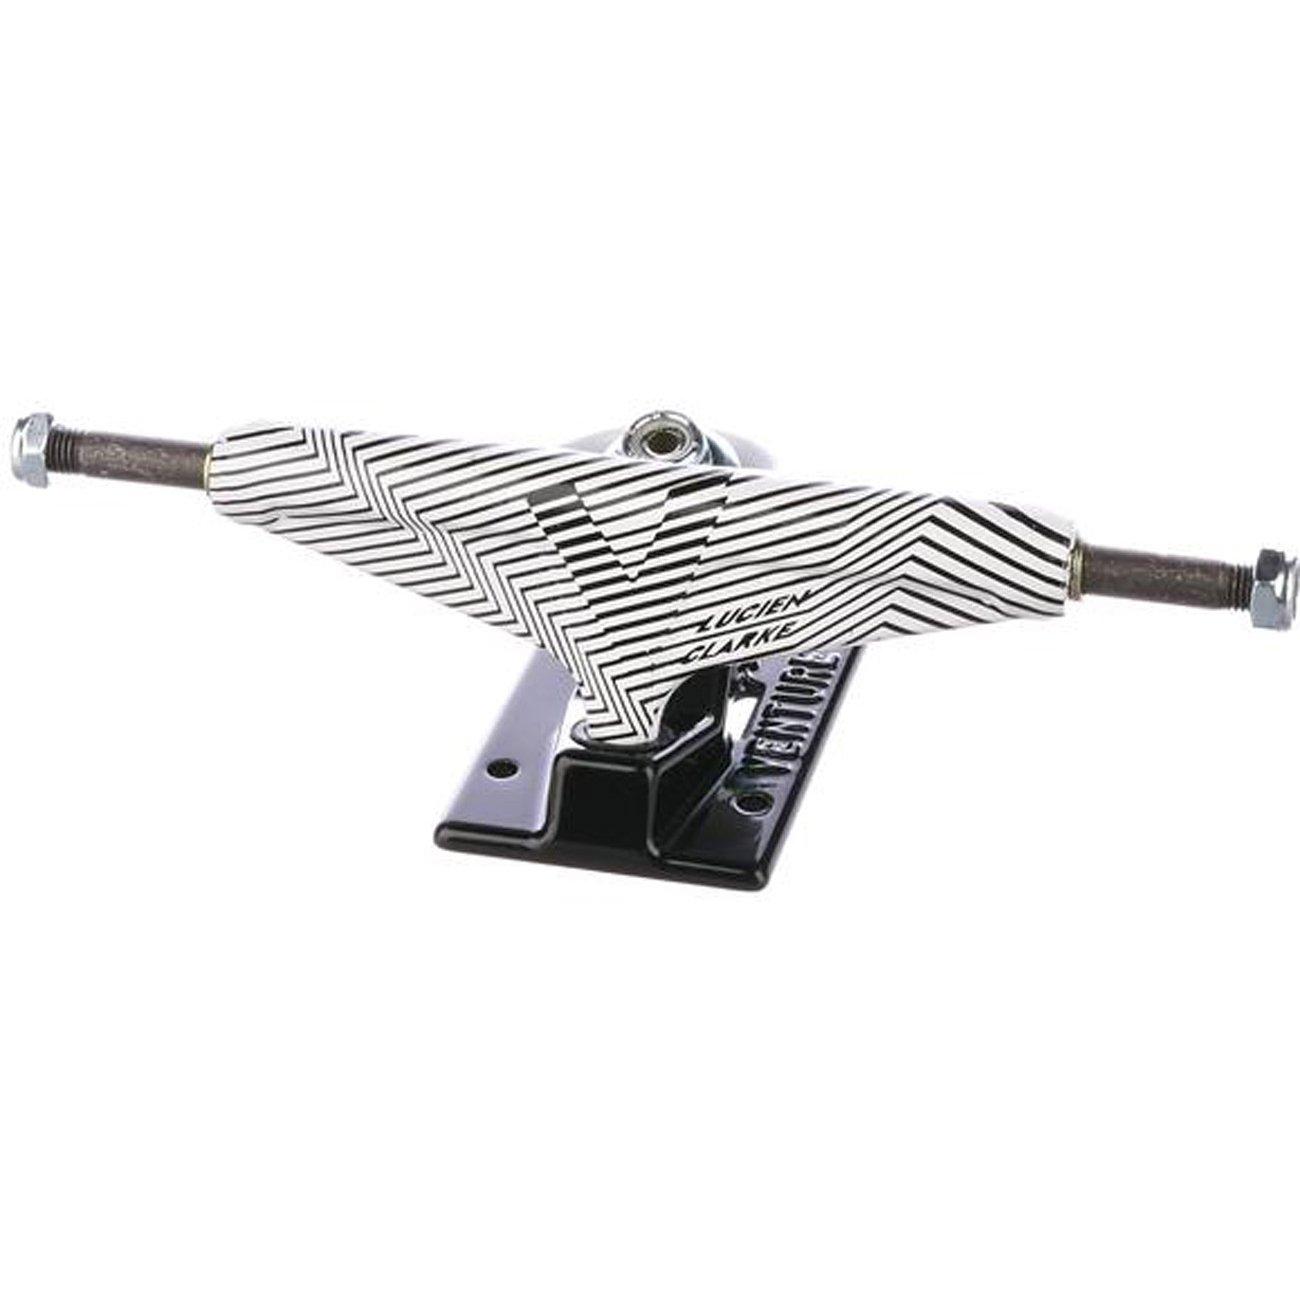 Venture Herren Skateboard Achse 5.2 Low Lucien Clarke Linear V-Light Größe:ONESIZE Farben:white-black